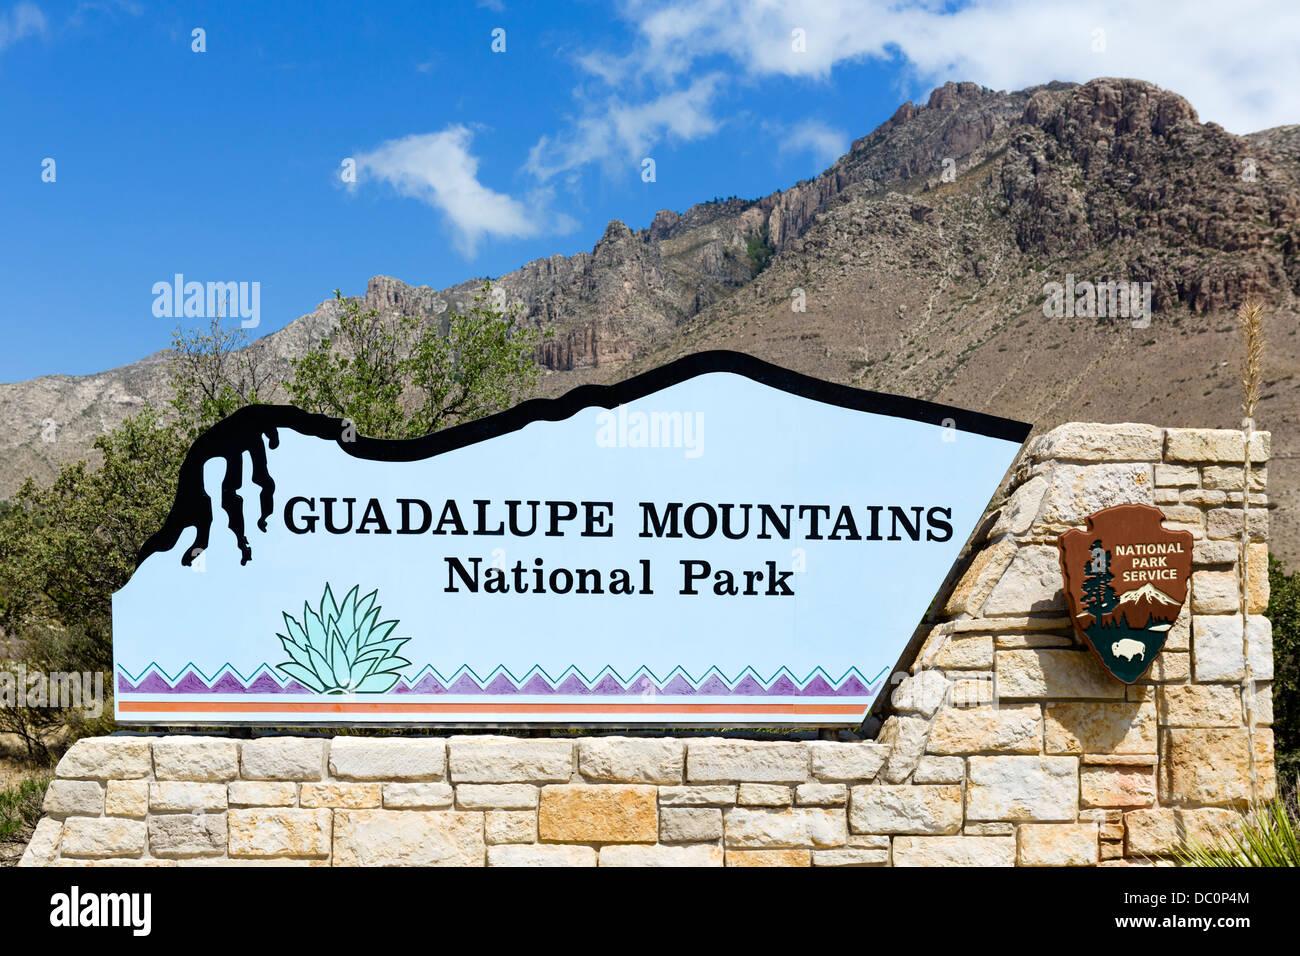 Eingang zu den Guadalupe Mountains Nationalpark, Texas, USA Stockbild